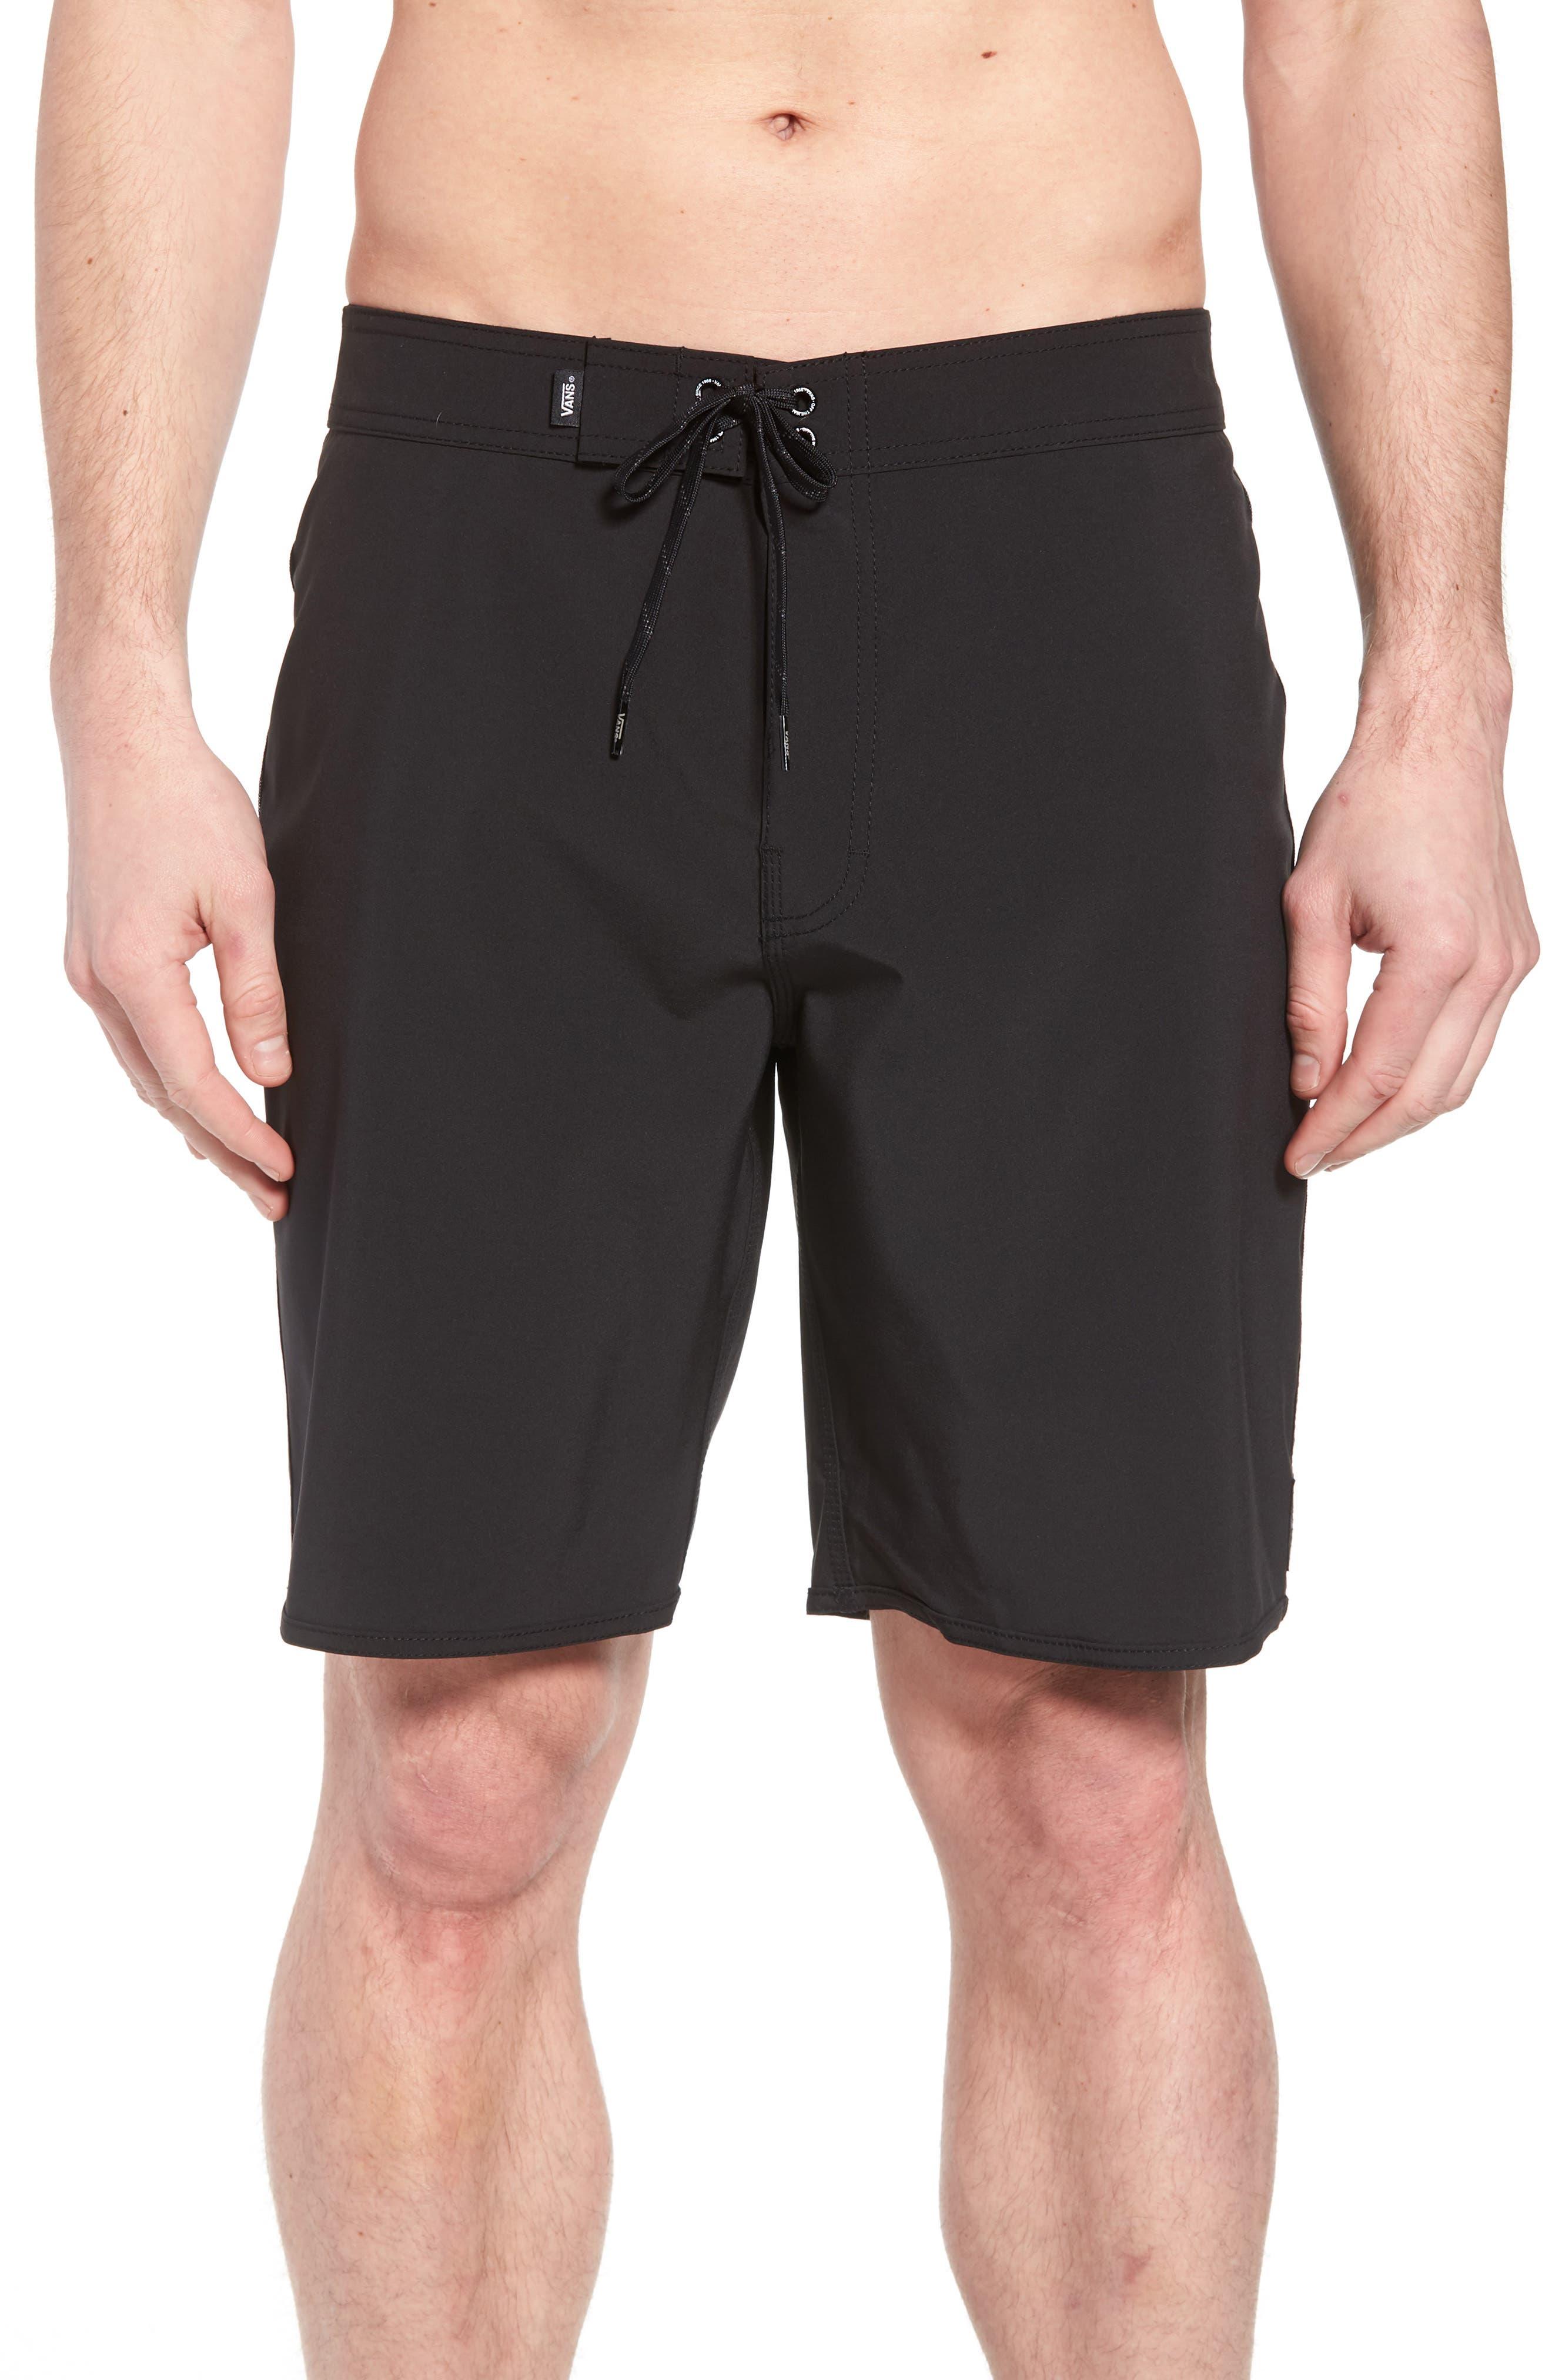 Alternate Image 1 Selected - Vans Houser Side Stripe Board Shorts